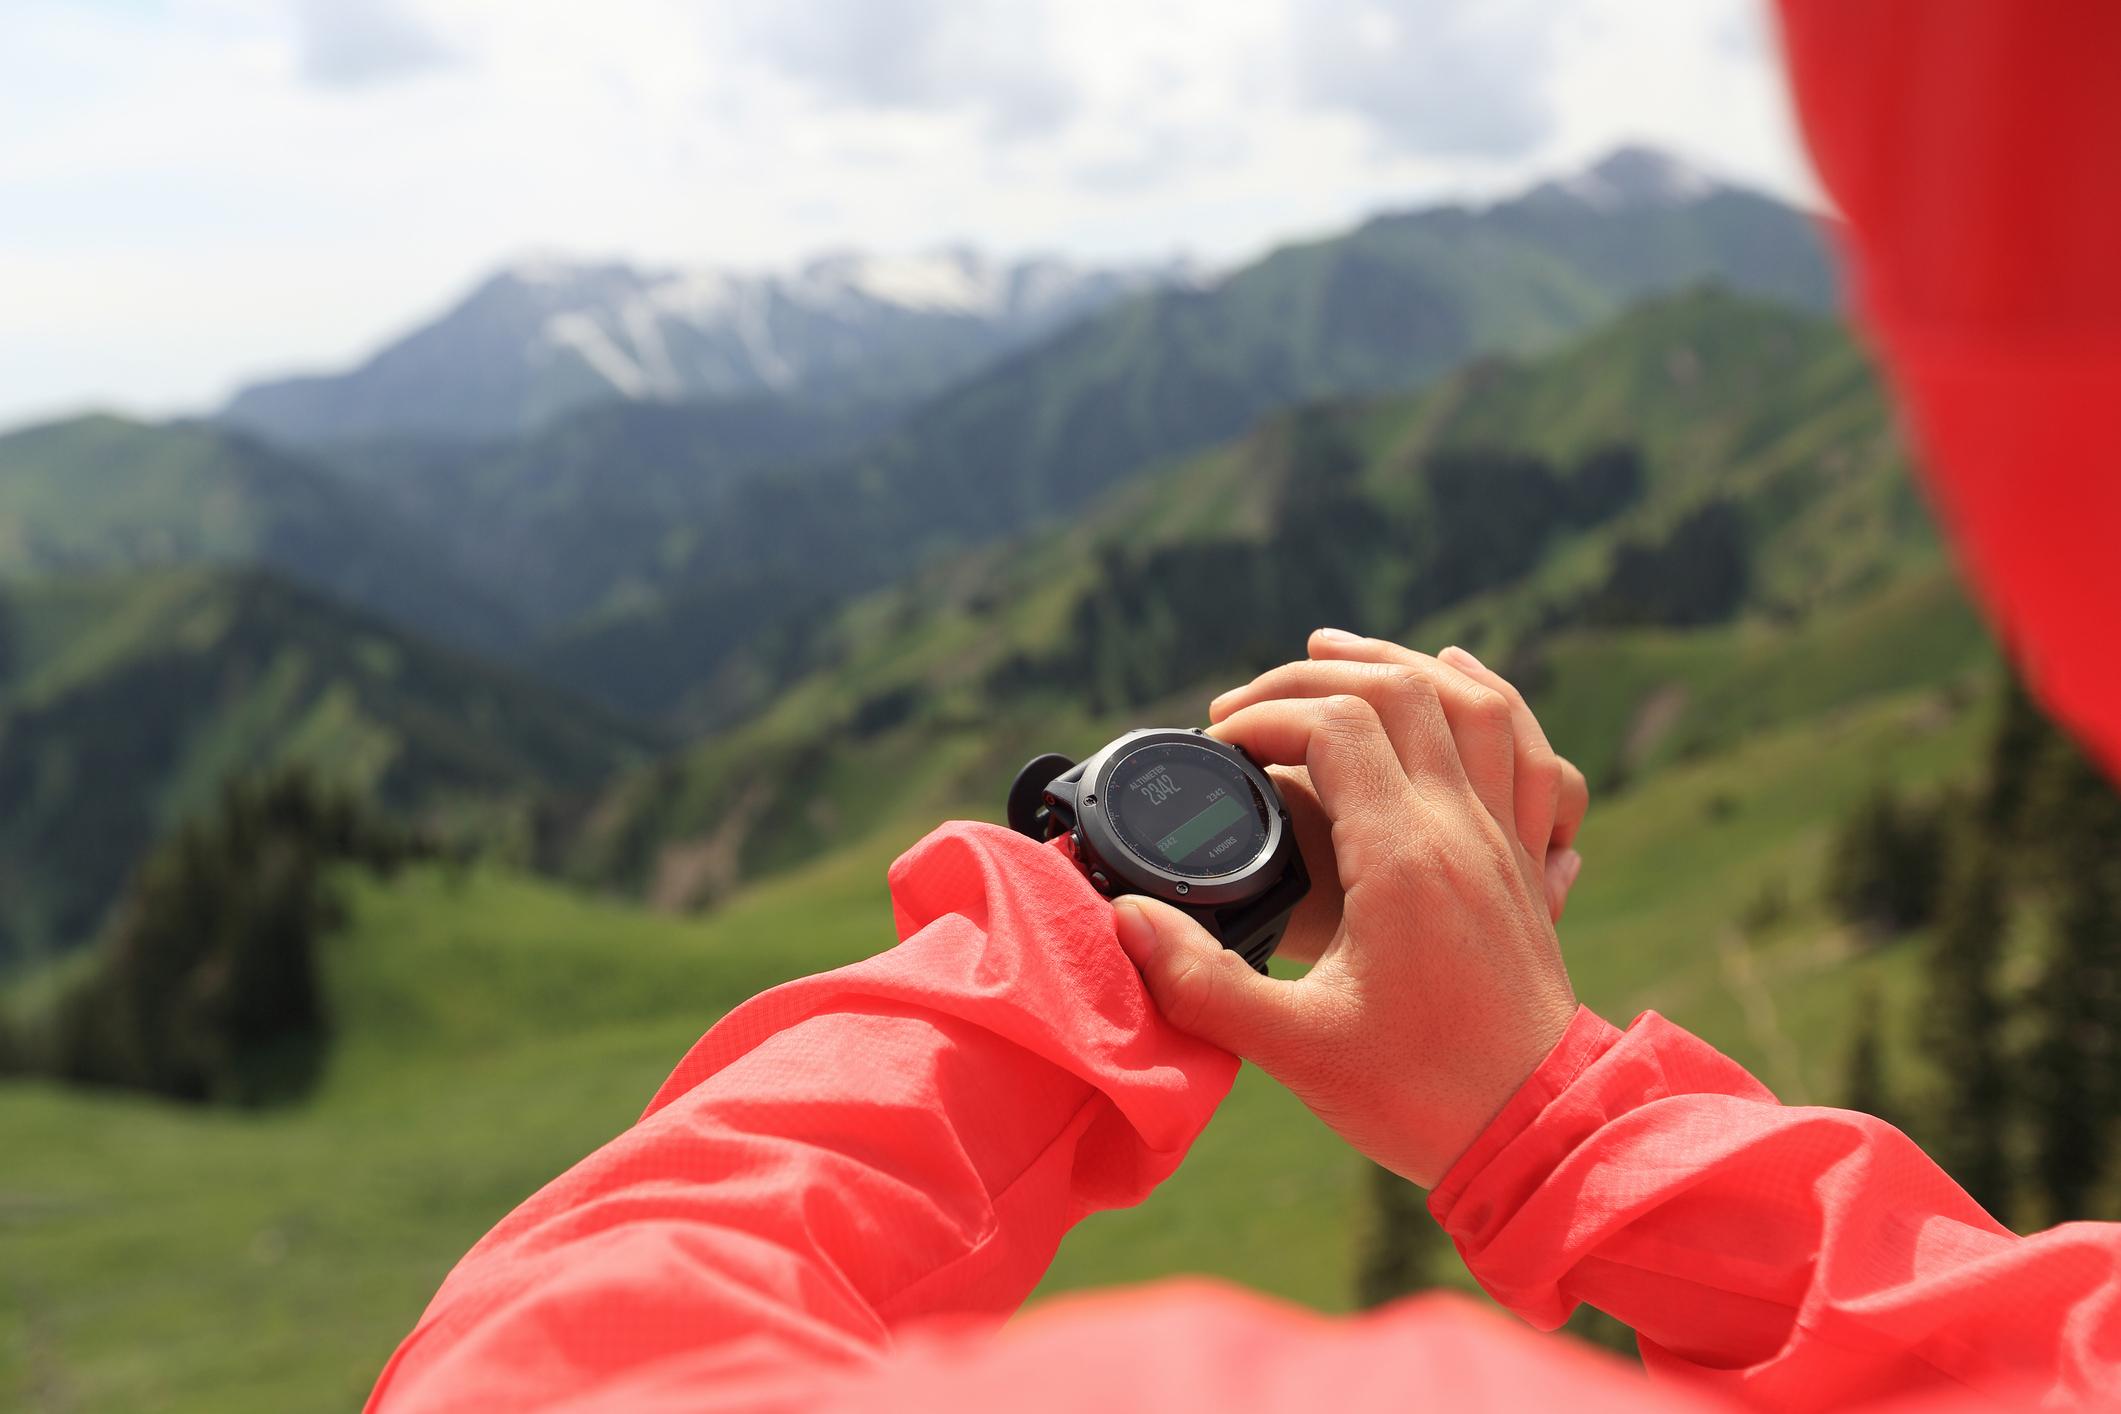 A hiker adjusts her smartwatch.